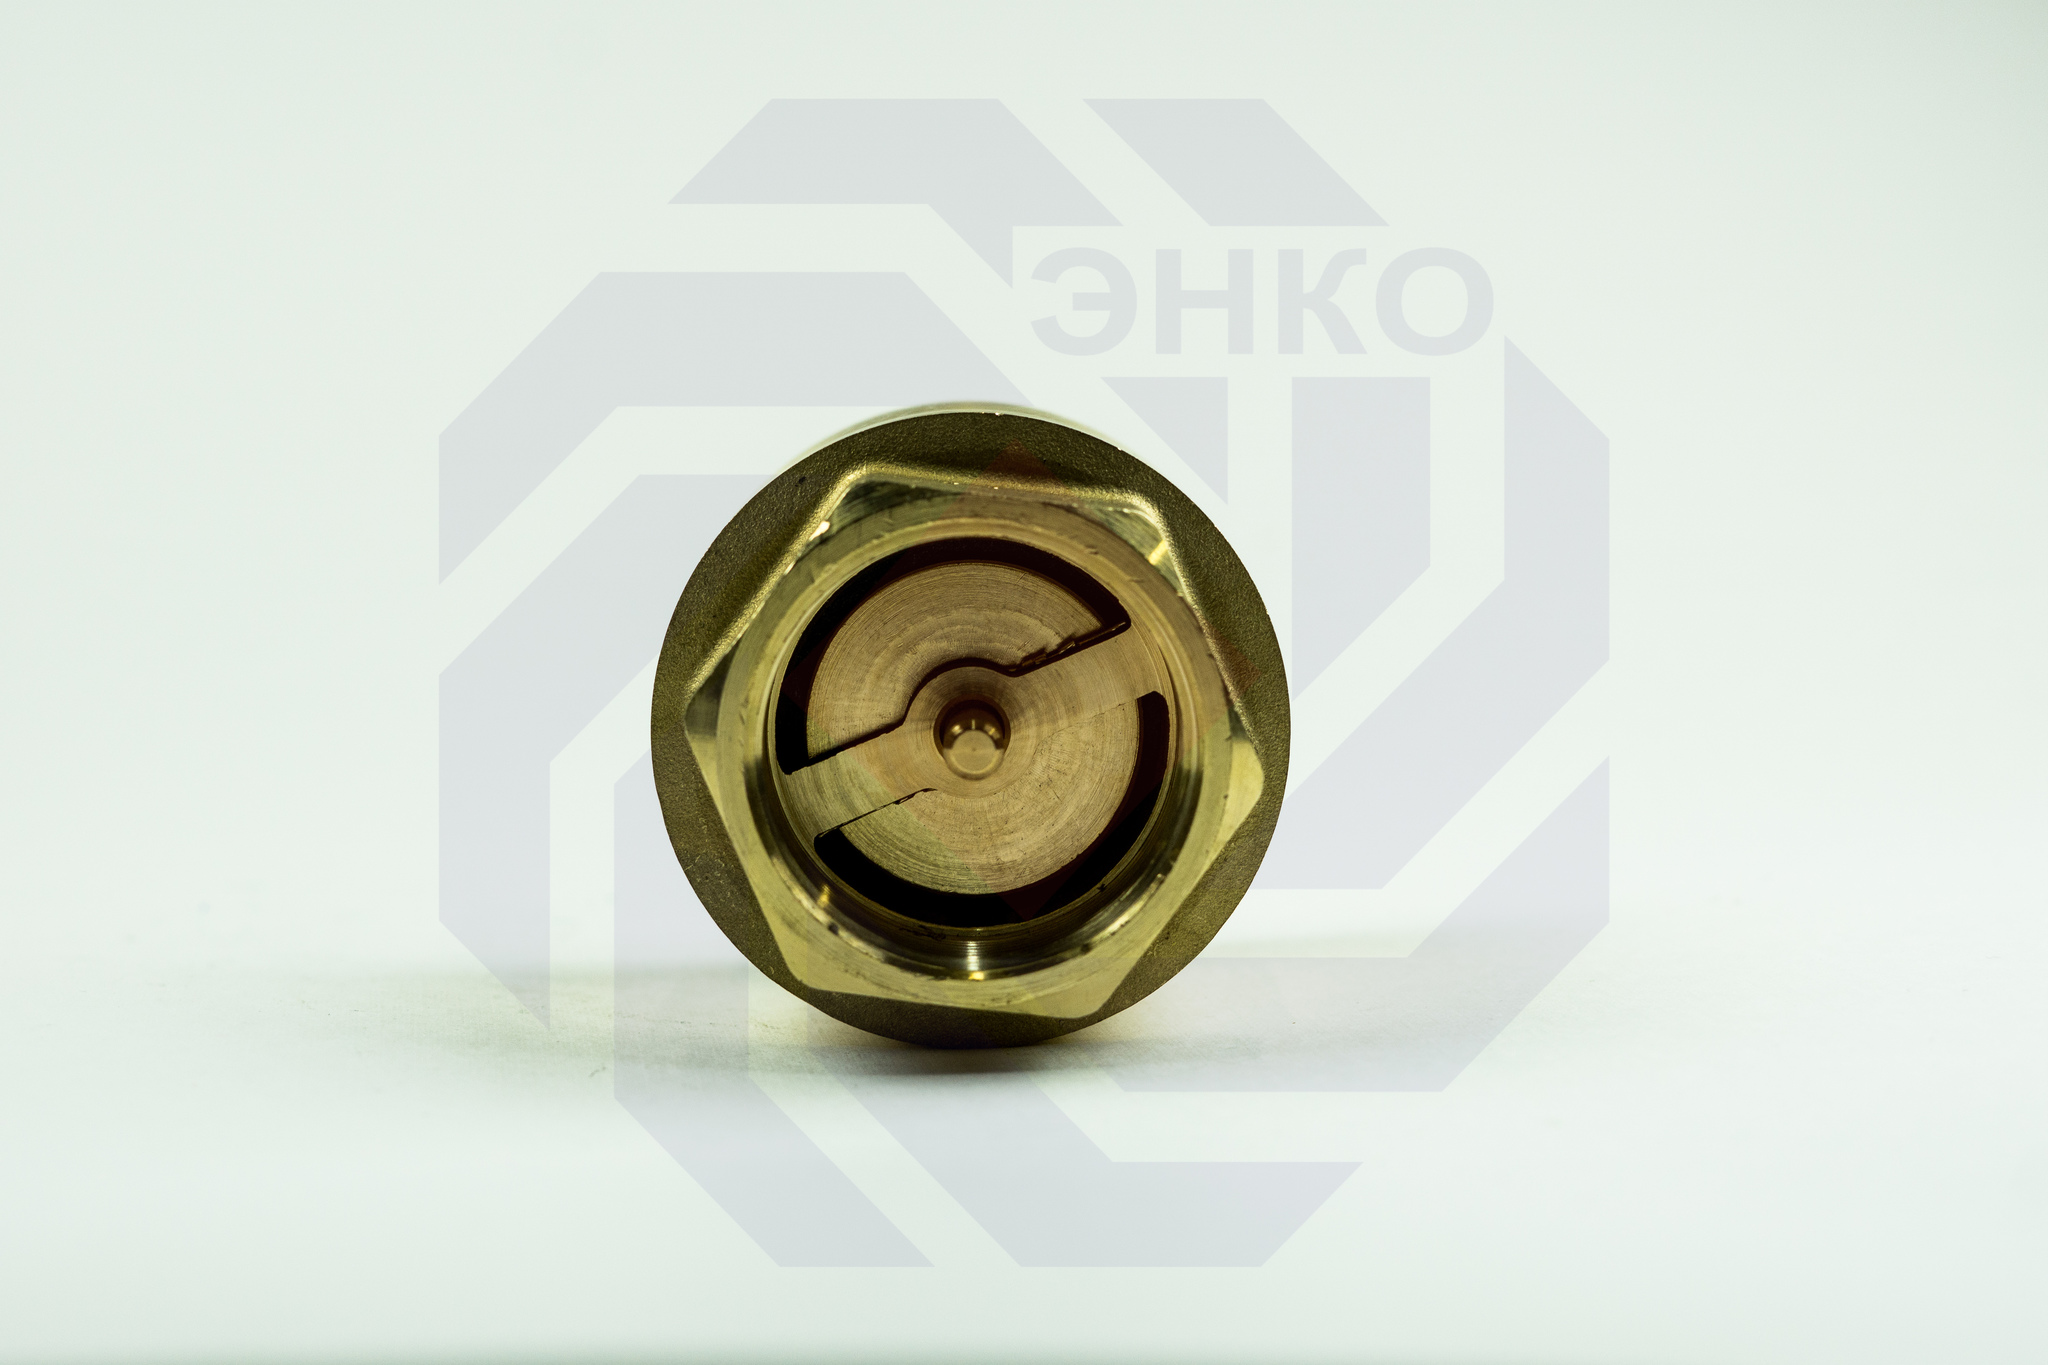 Клапан обратный ВР/ВР BUGATTI EURO 2000 1½